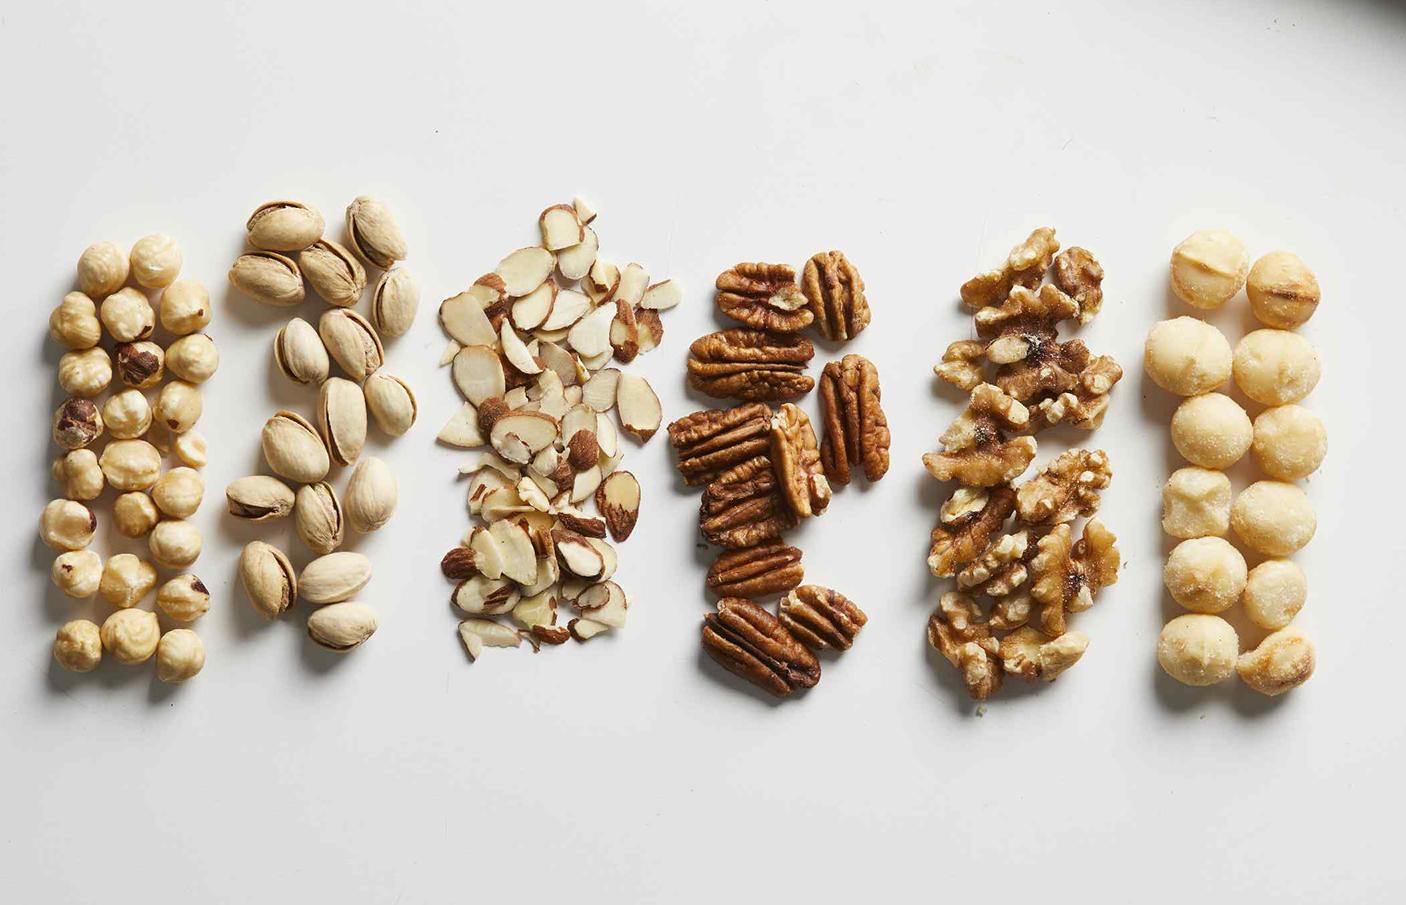 Macadamias, pistachios, almonds, pecans, walnuts, hazelnuts